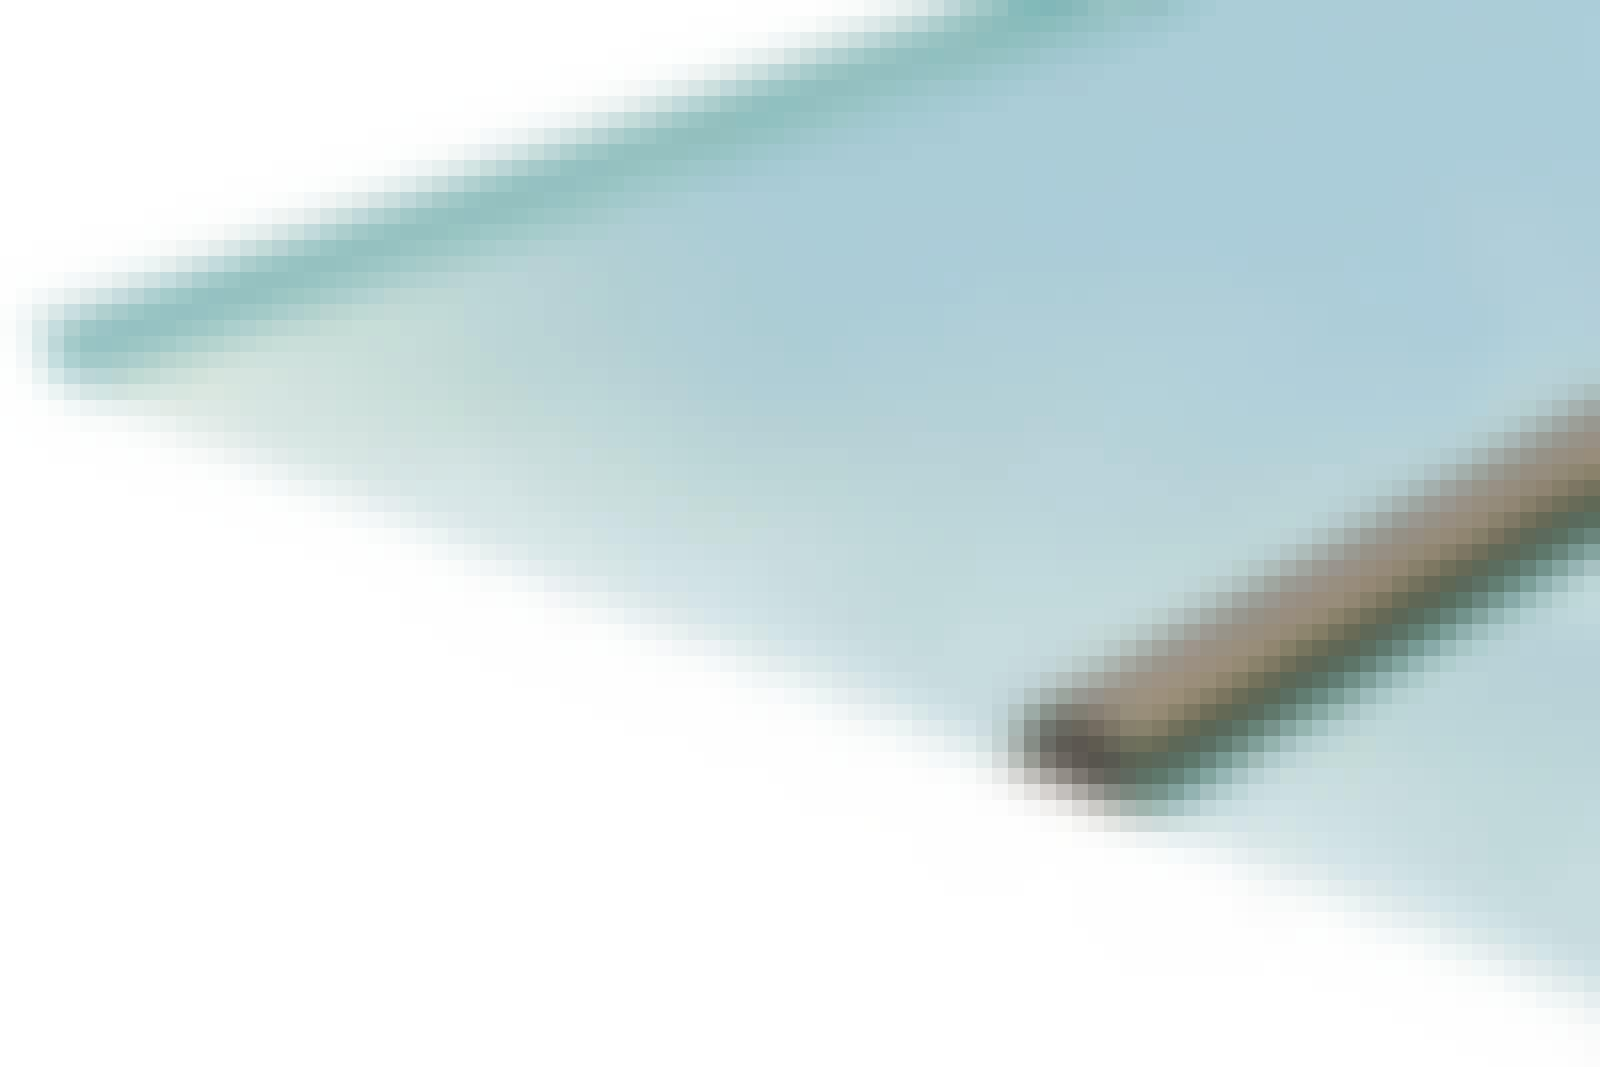 Sunglaze plastplader: Samlinger